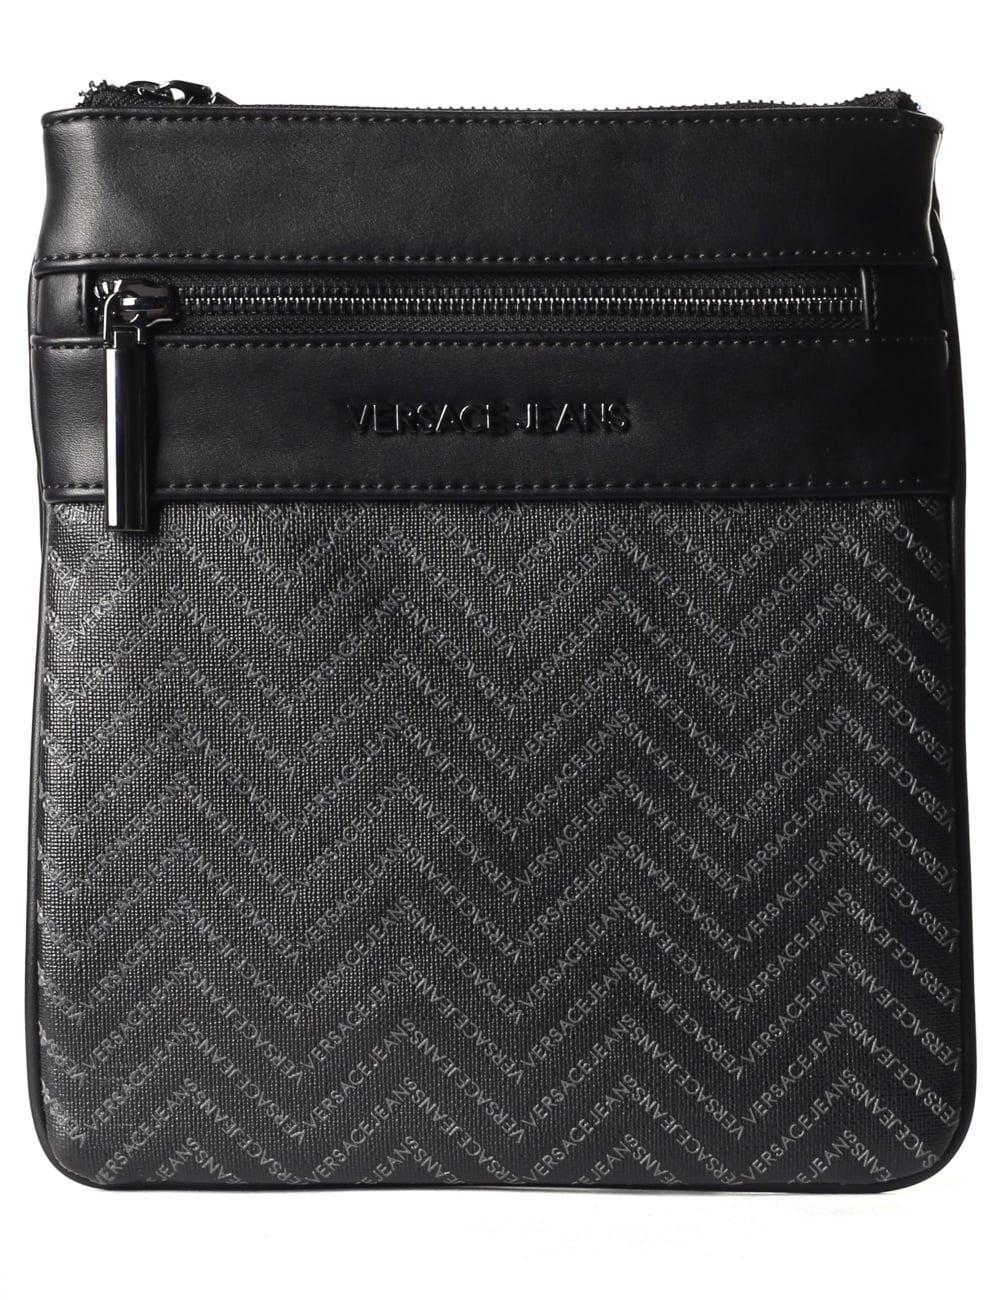 Versace Jeans Men s Crossbody Satchel Bag 4bab9643c22ac